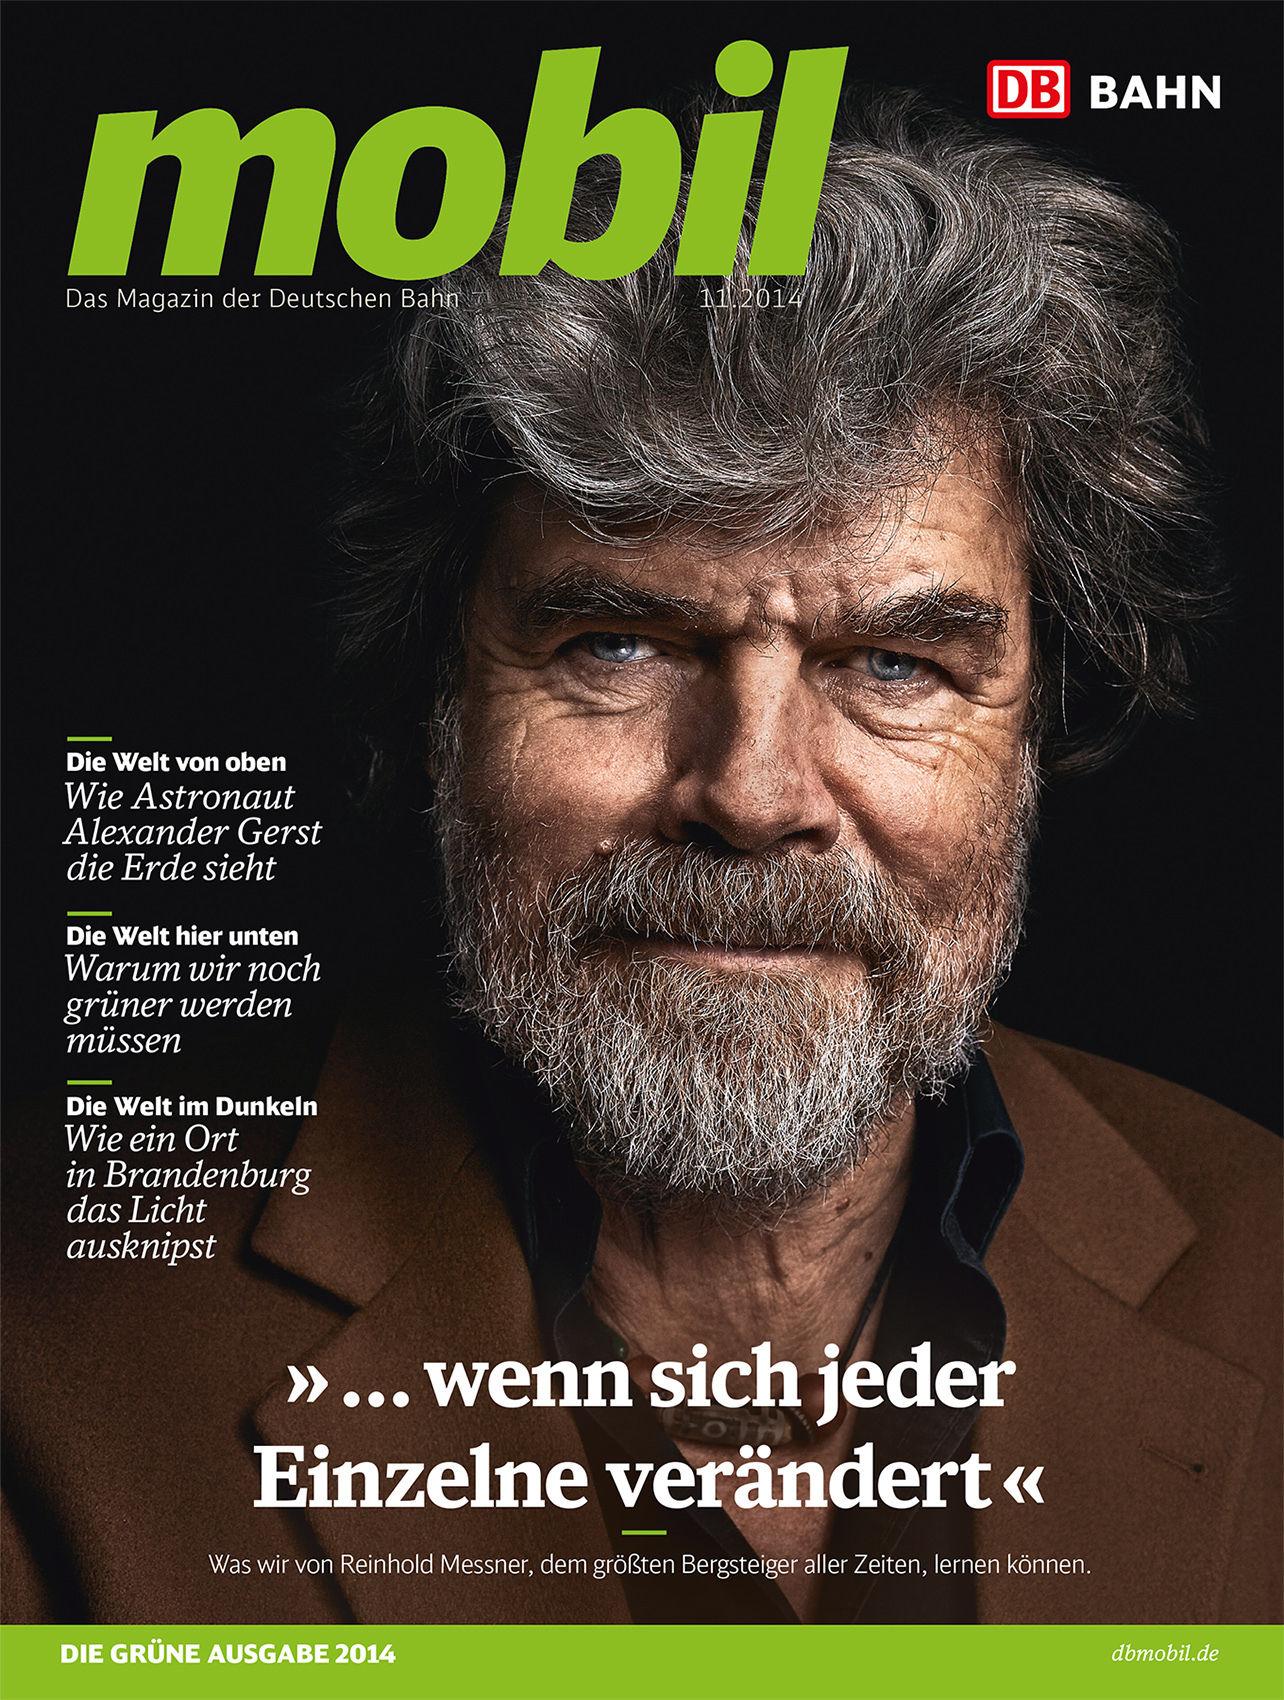 Marco J. Schöler fotografiert Reinhold Messner für DB mobil